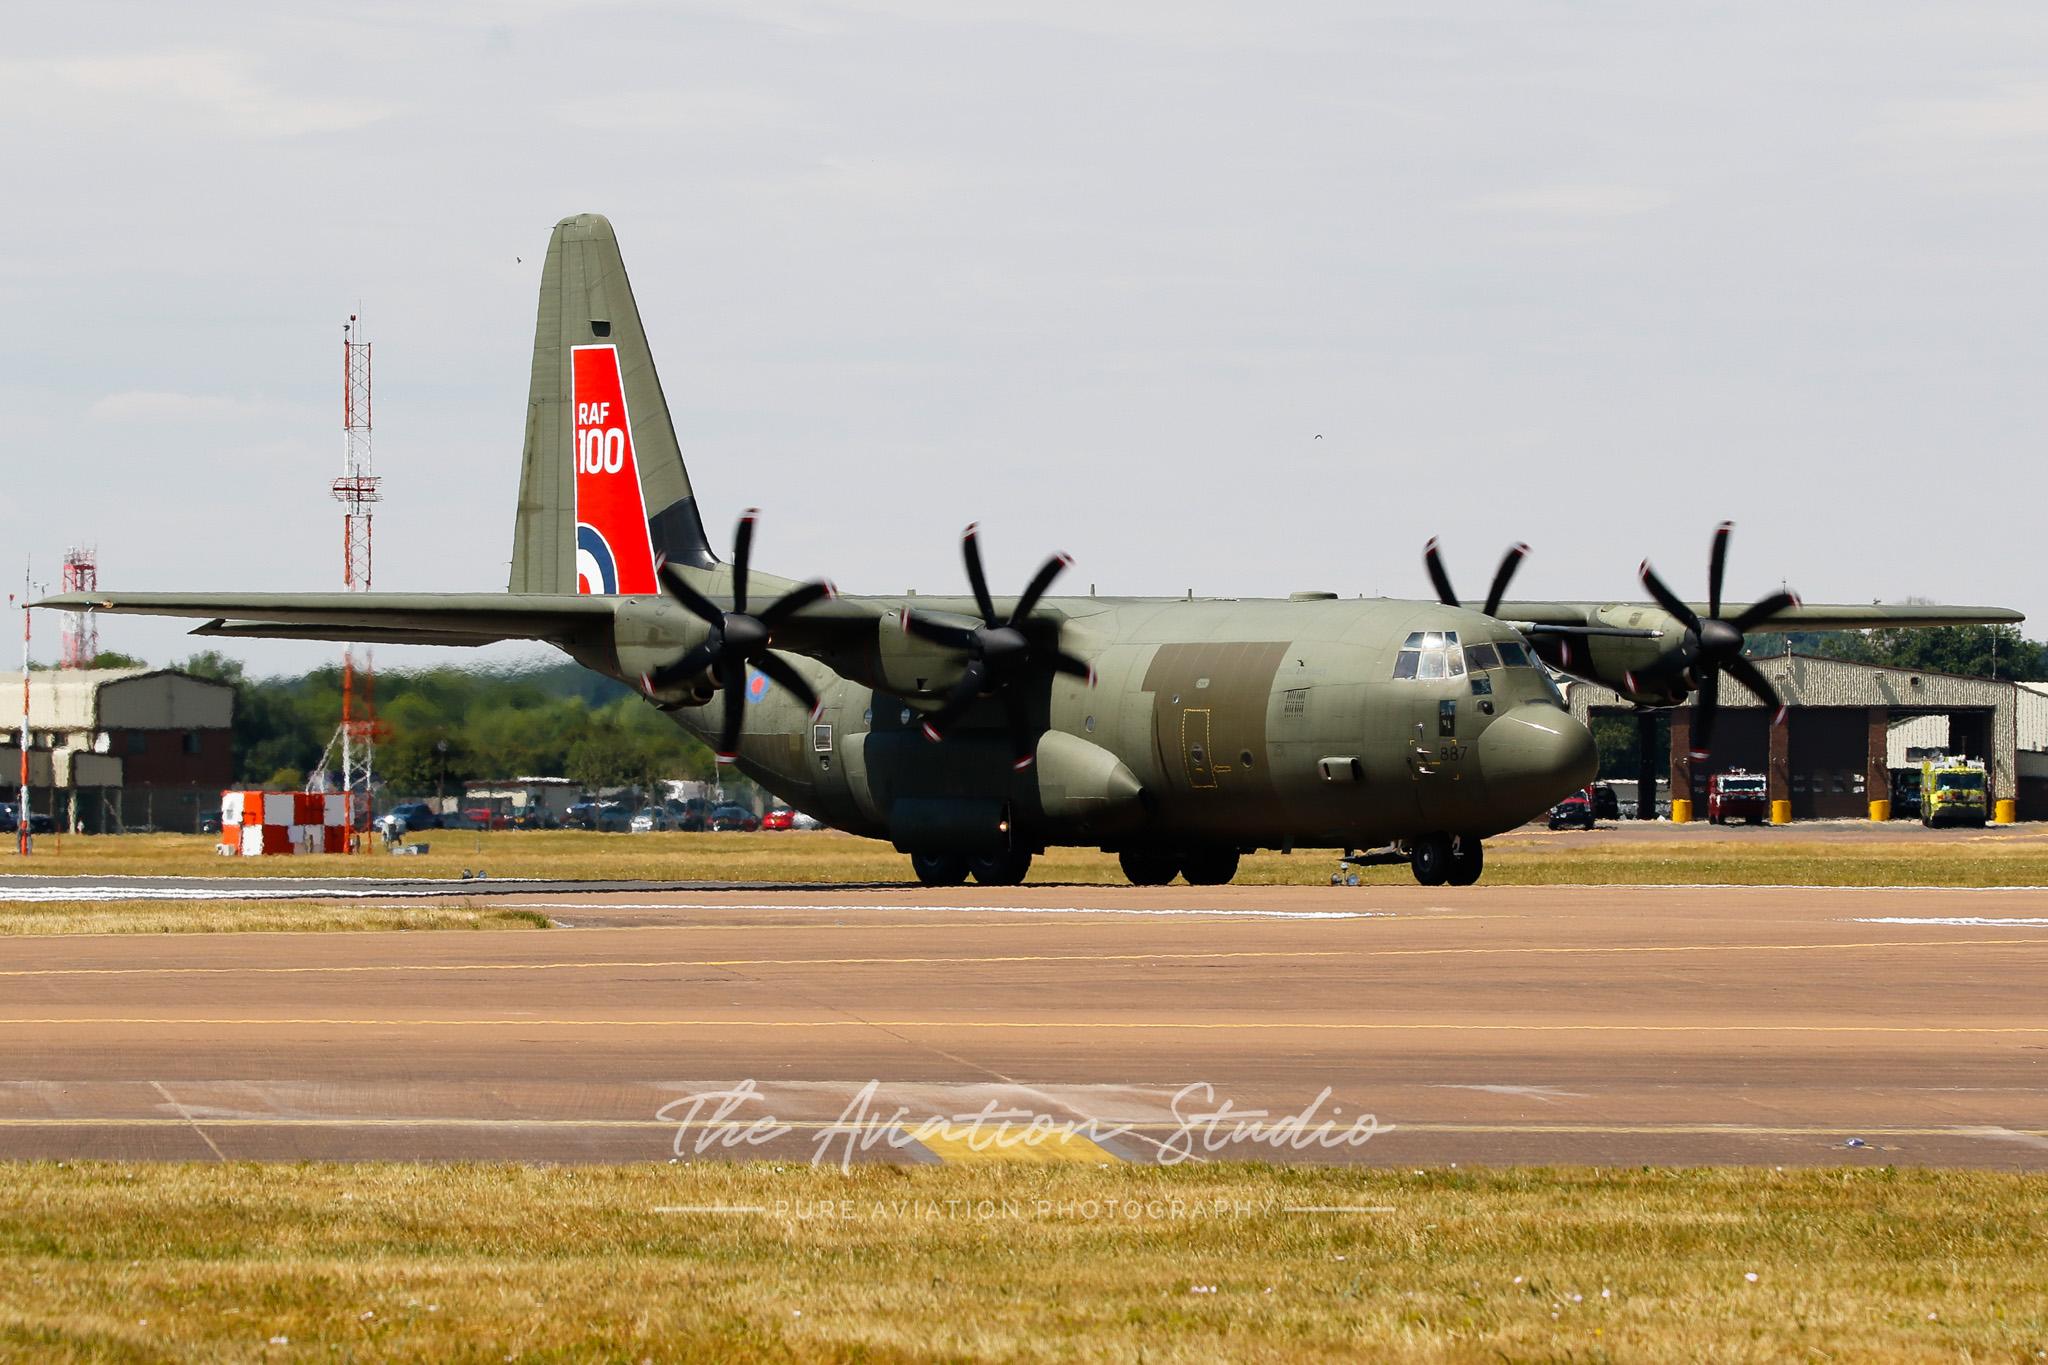 RAF Lockheed Martin C-130J Hercules